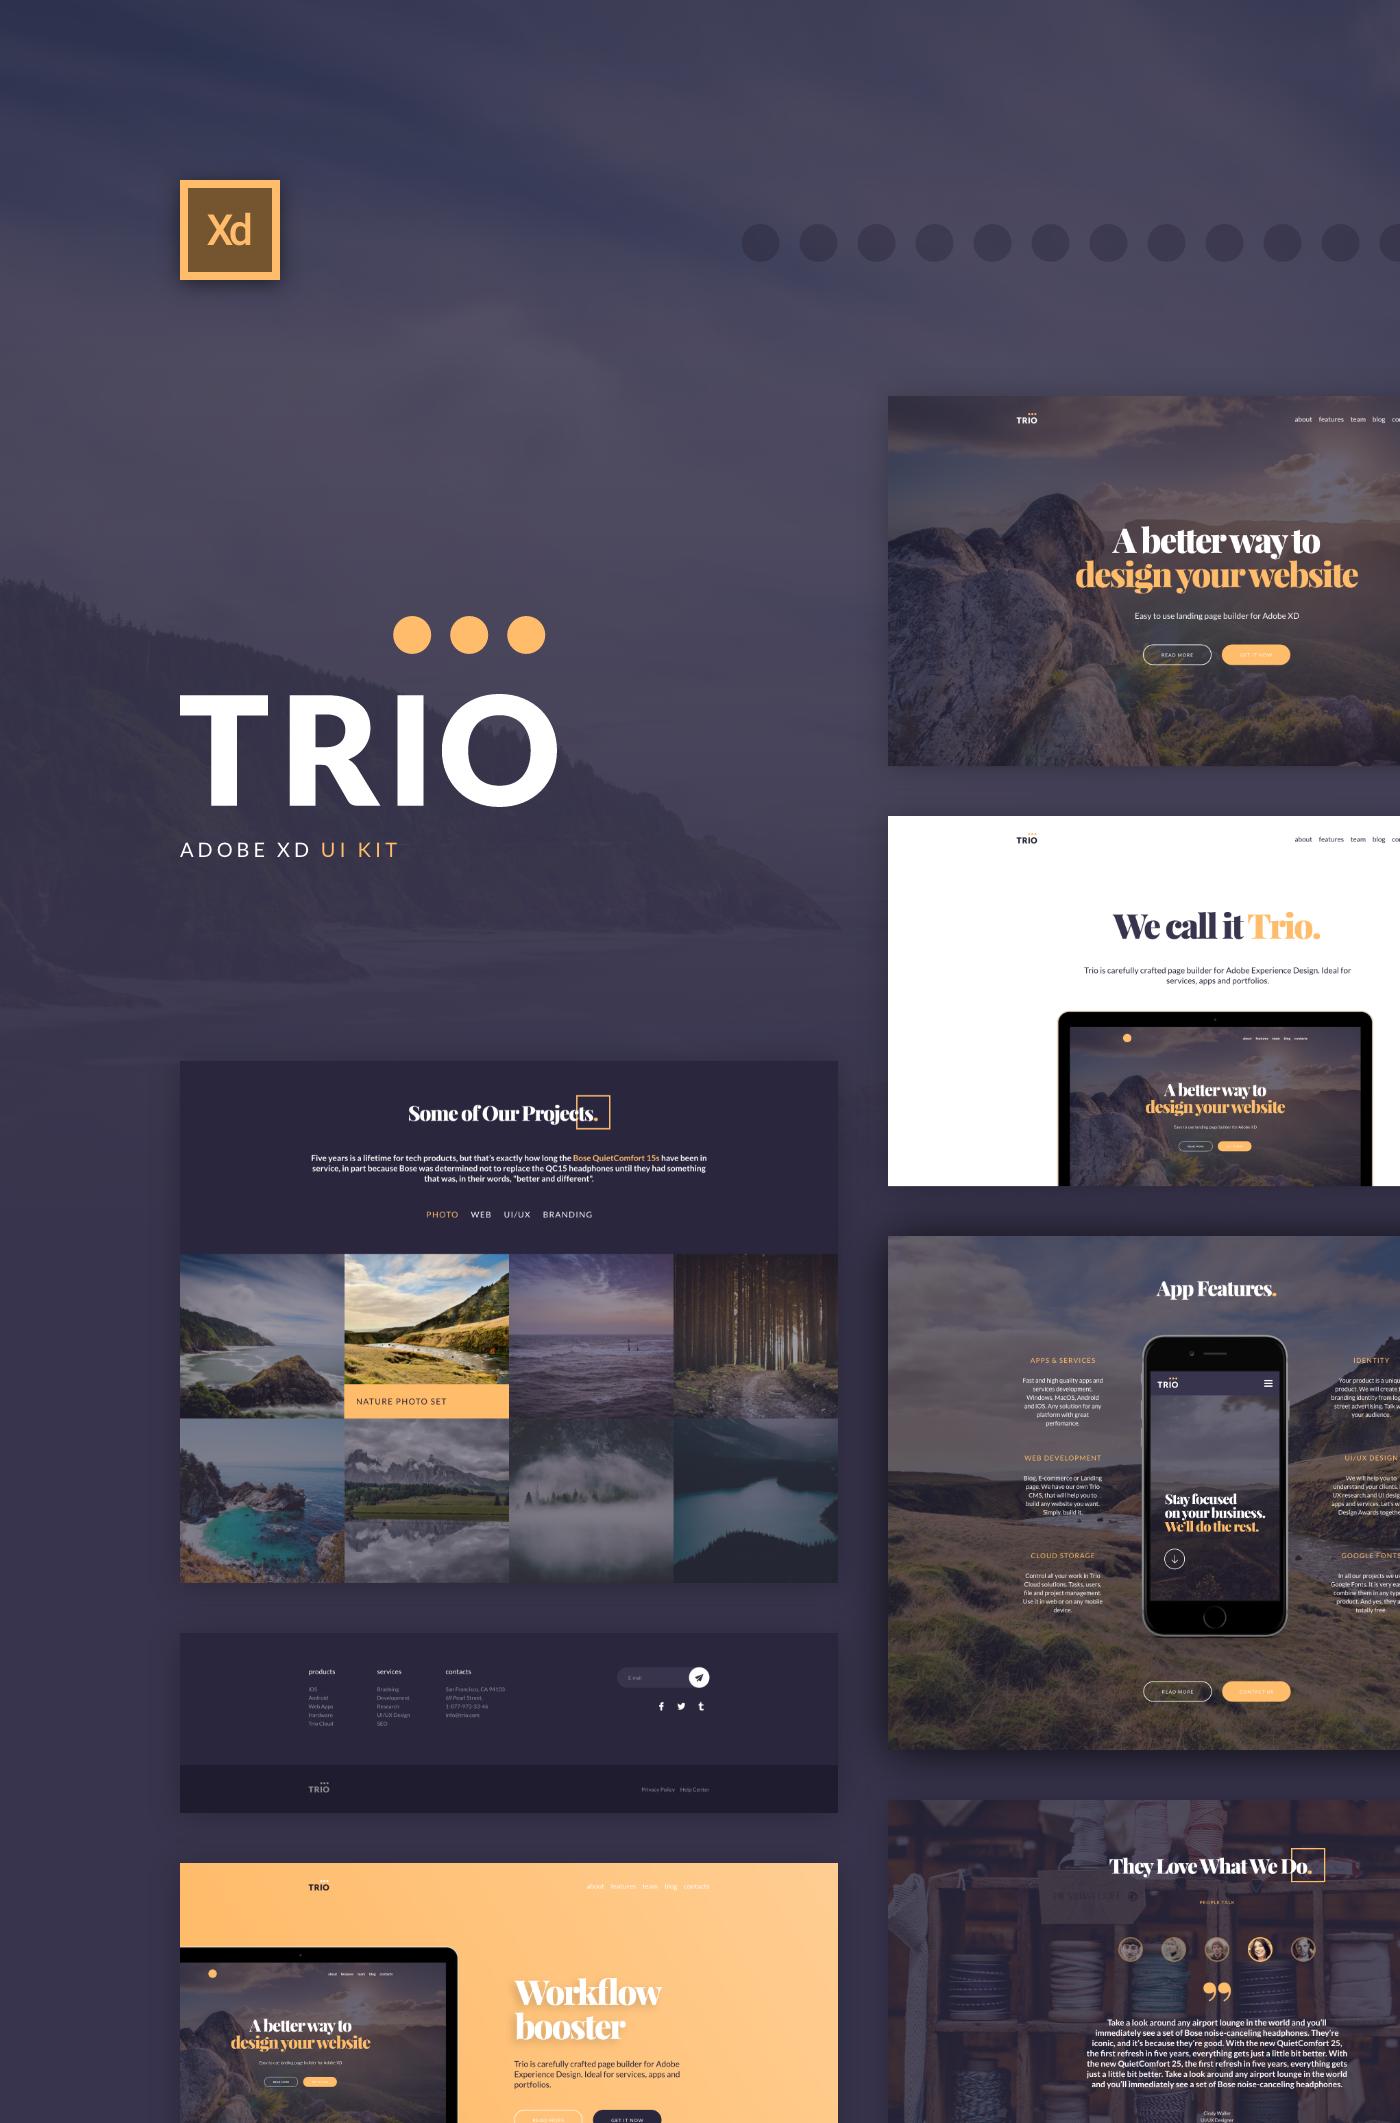 Trio Ui Kit For Adobe Xd On Behance